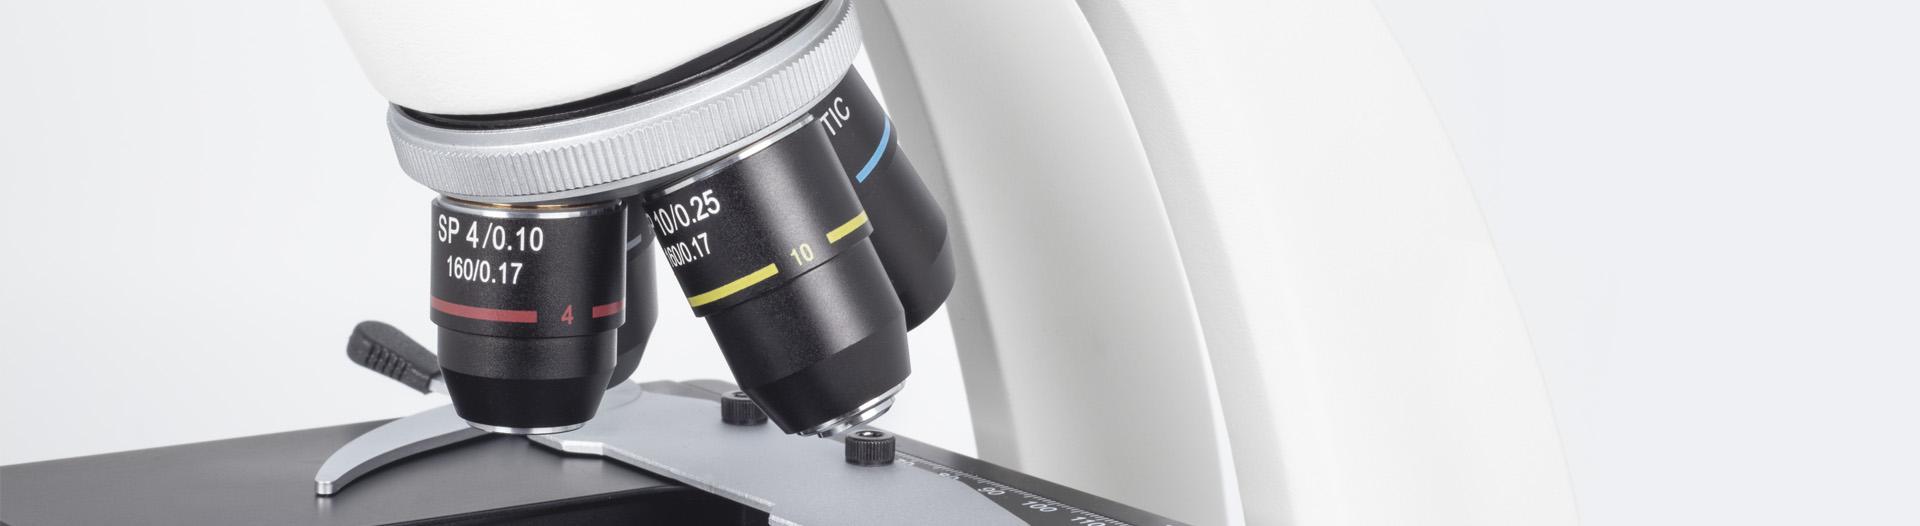 RED200 microscope optics